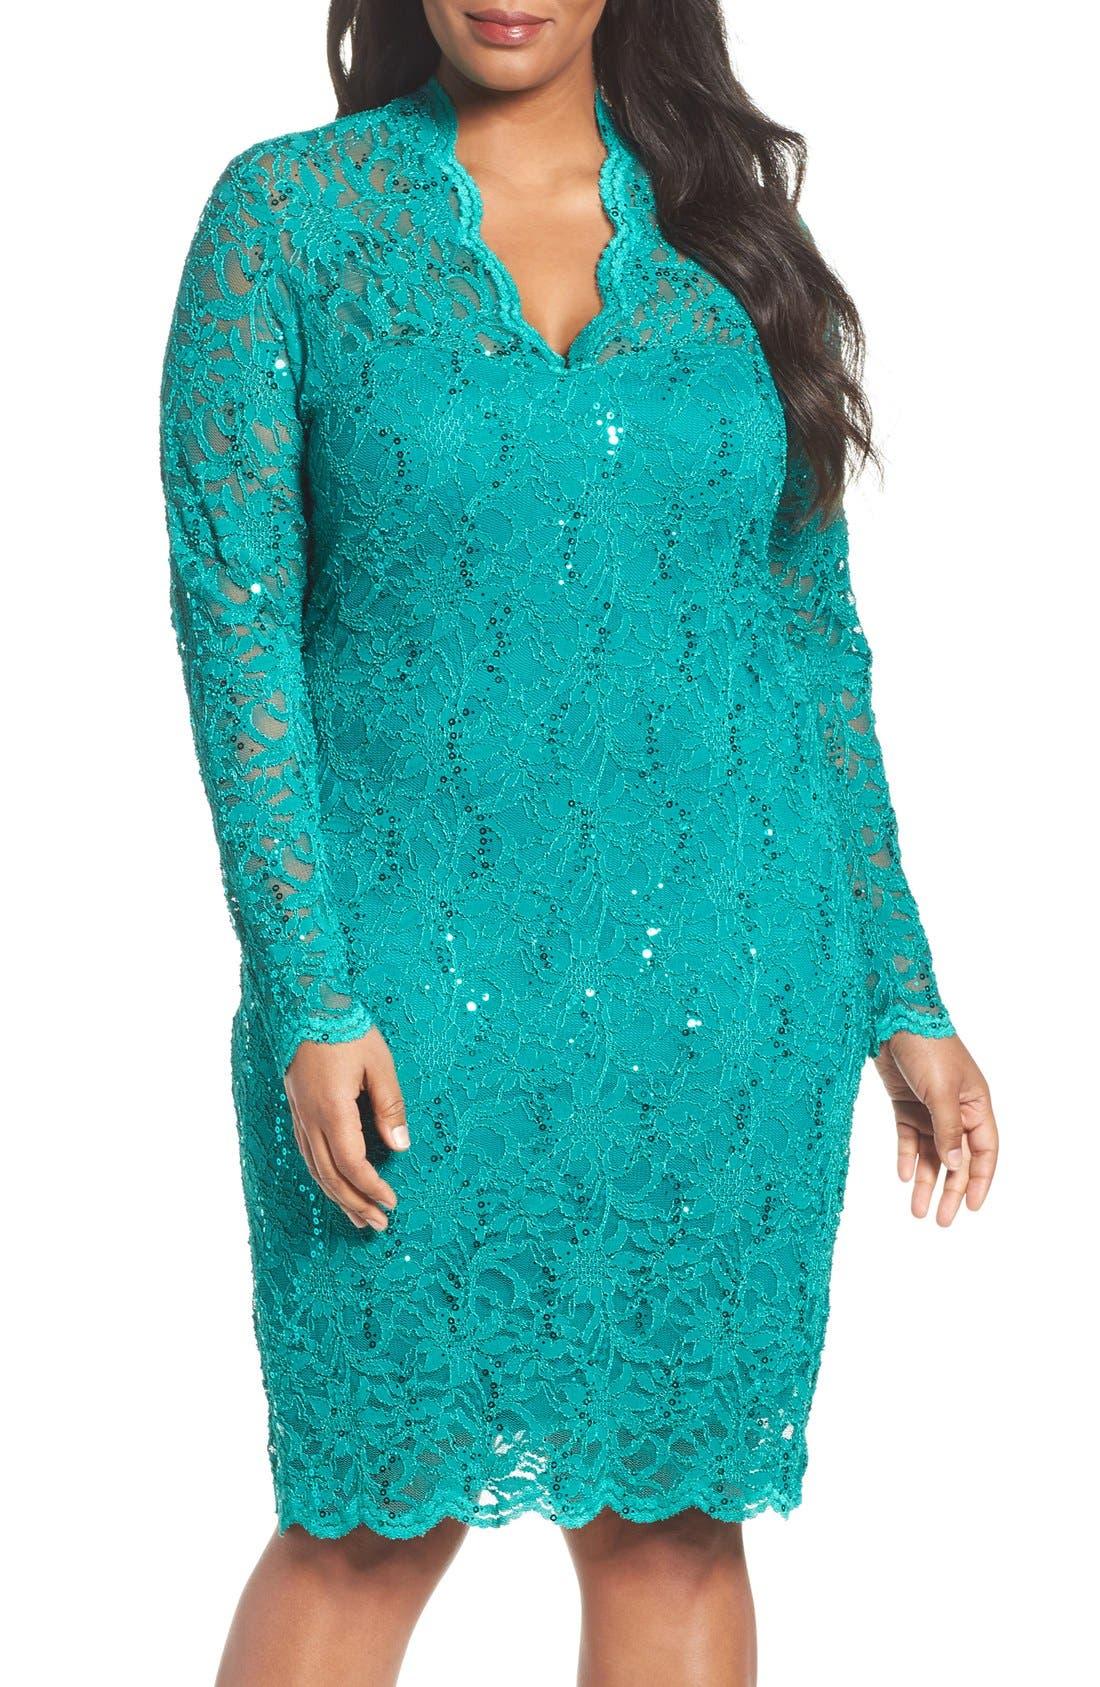 Alternate Image 1 Selected - Marina Sequin Stretch Lace Sheath Dress (Plus Size)